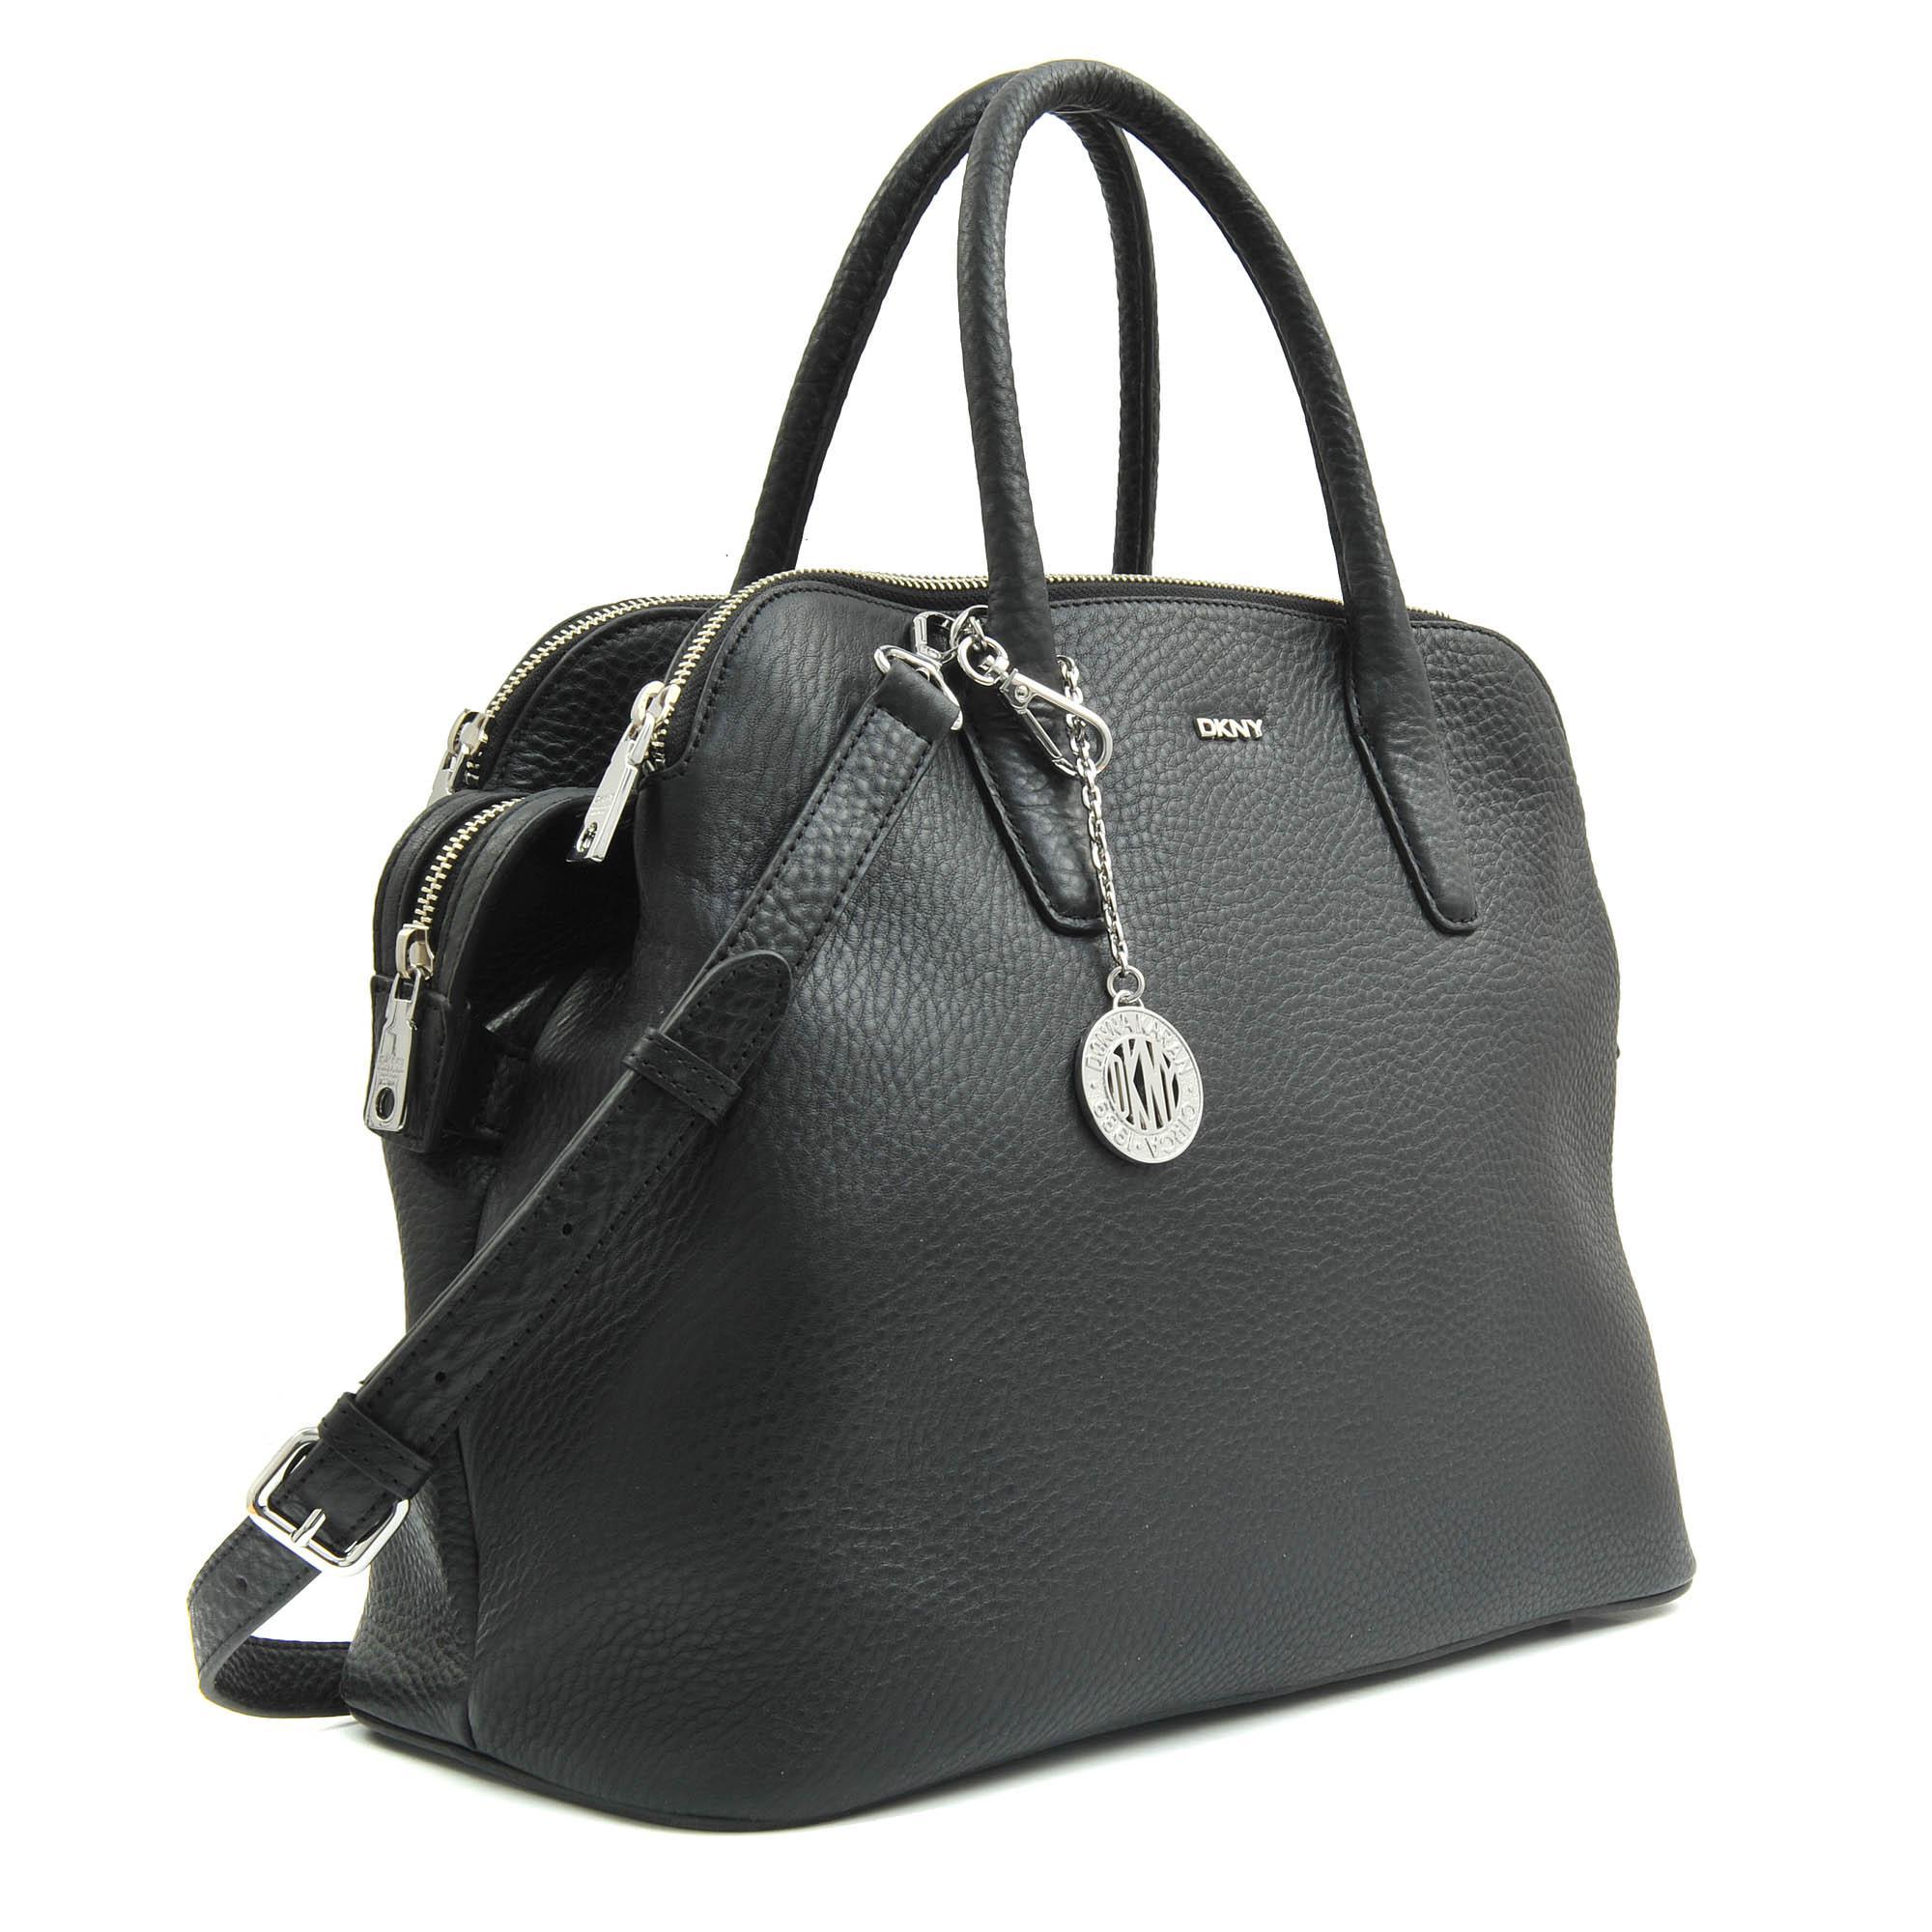 dkny triple zip tribeca bag in black lyst